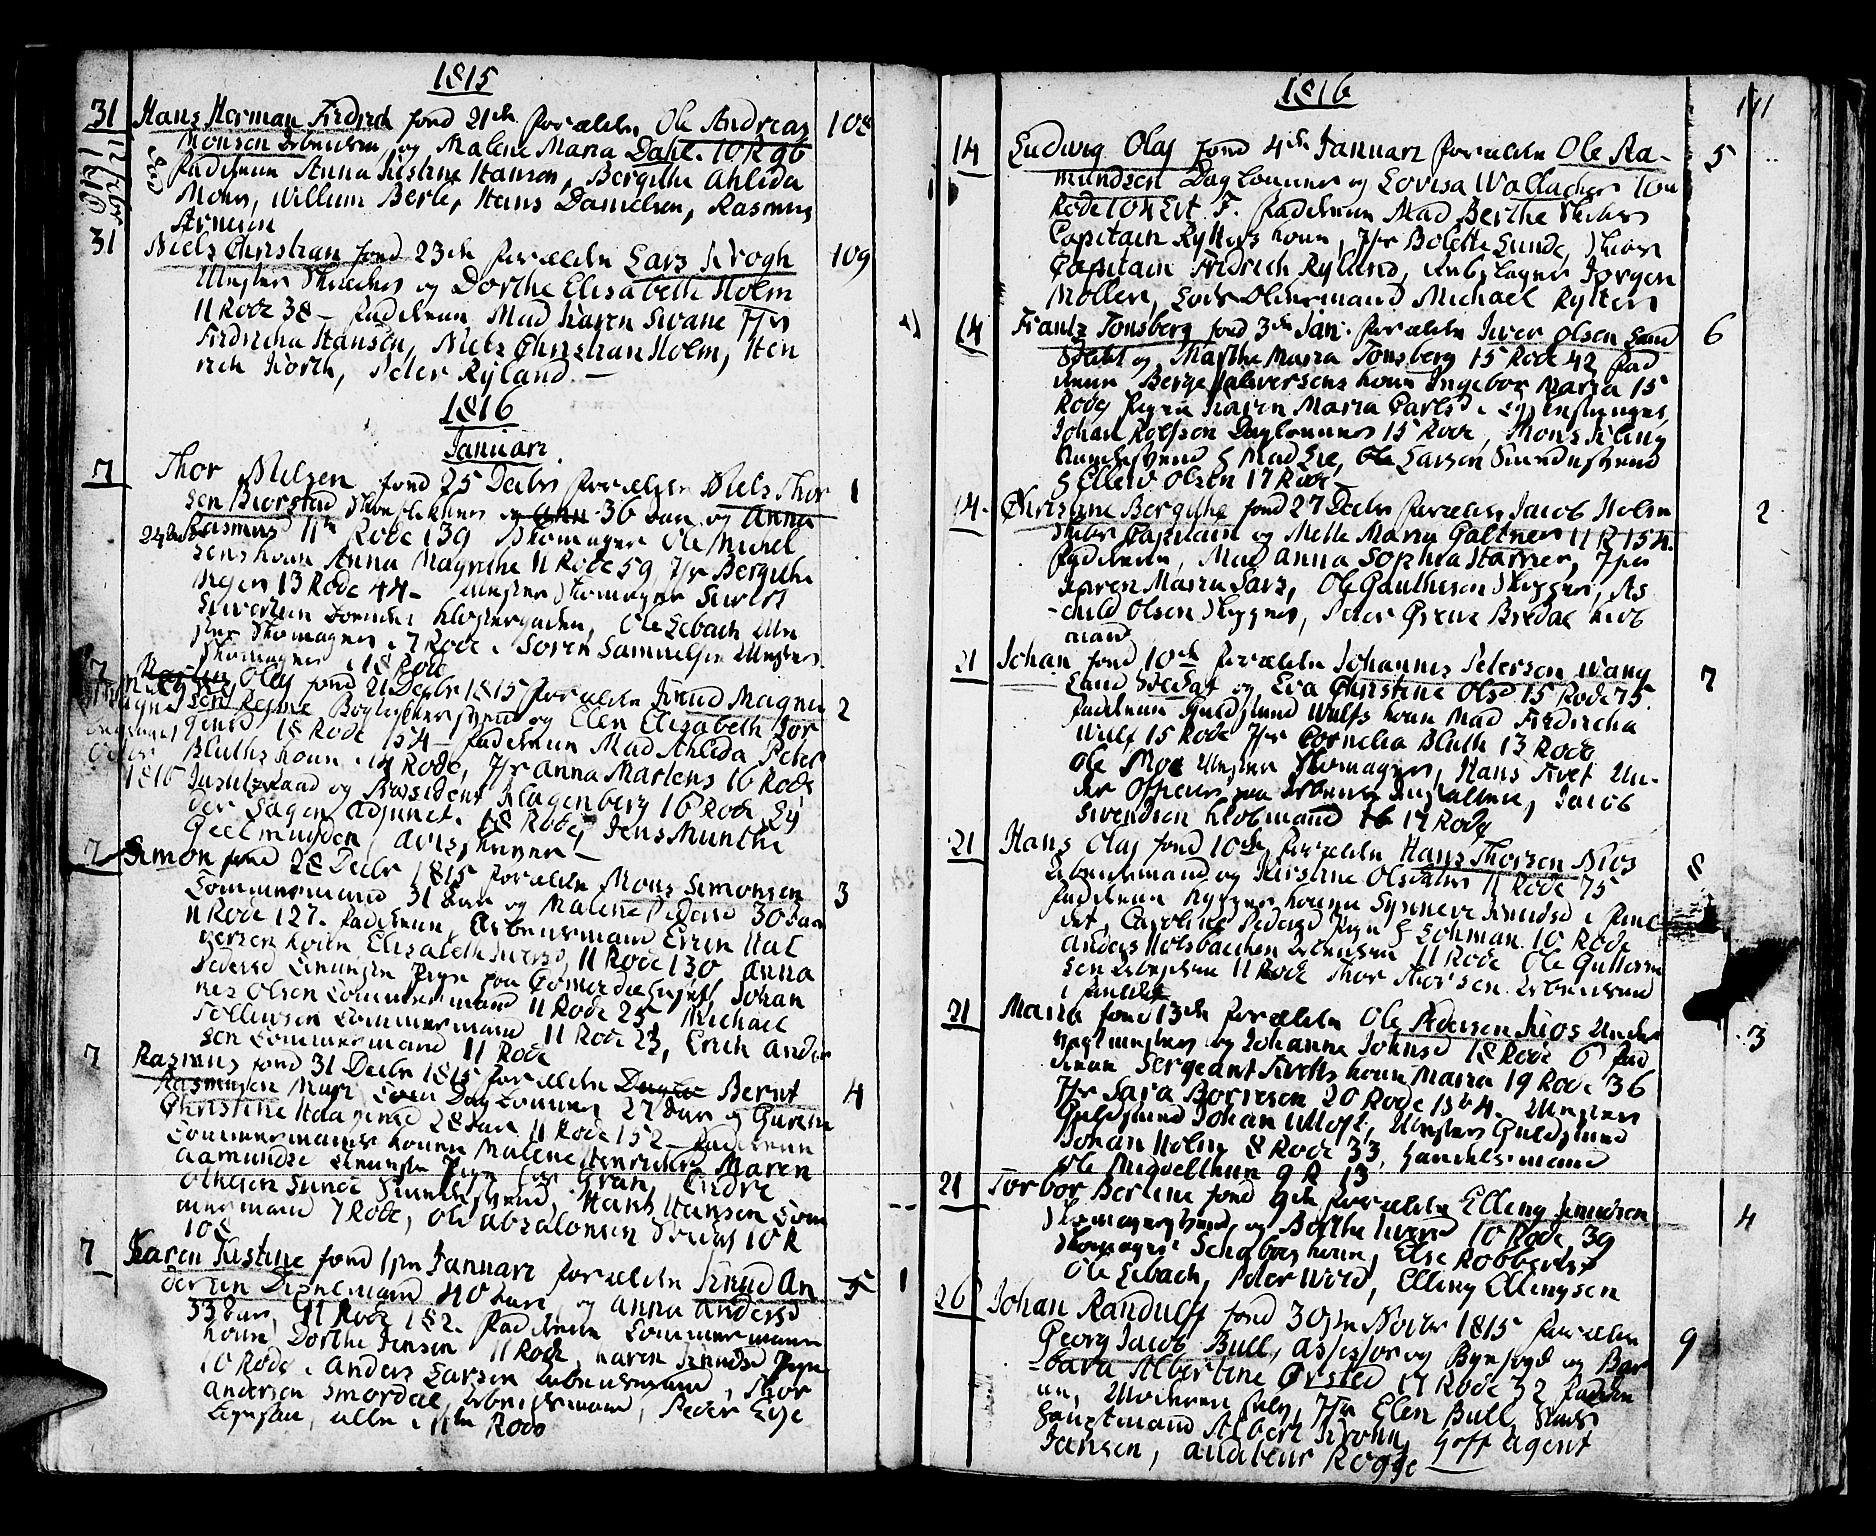 SAB, Domkirken Sokneprestembete, H/Haa/L0005: Ministerialbok nr. A 5, 1808-1820, s. 110-111